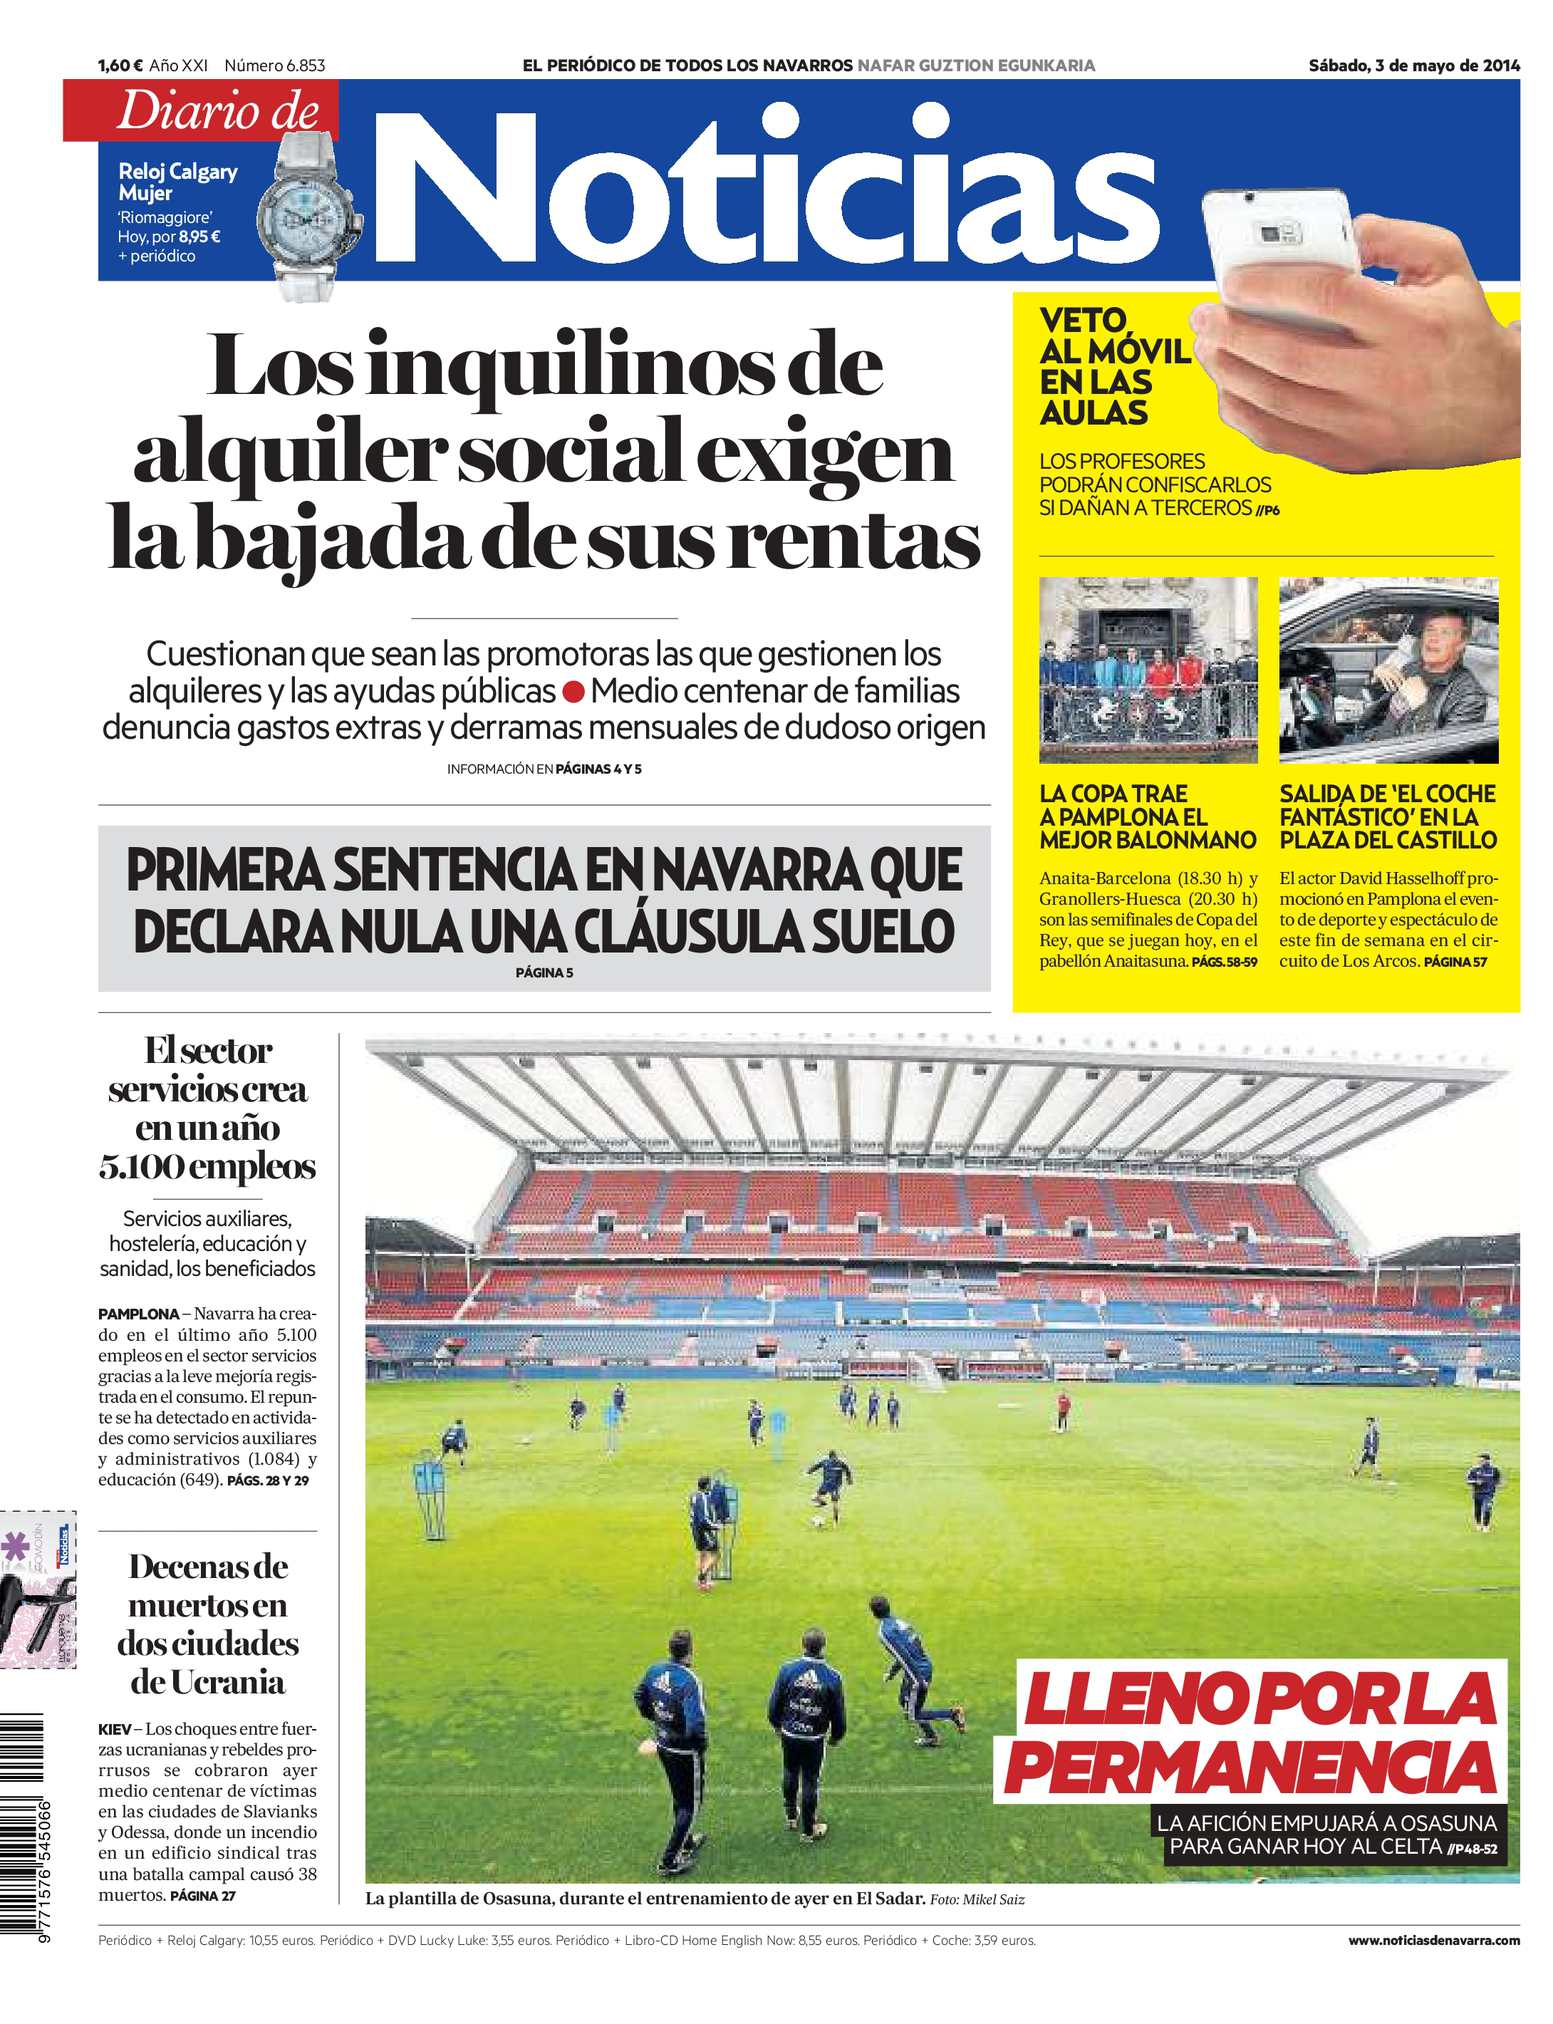 54f59ce4039c Calaméo - Diario de Noticias 20140503